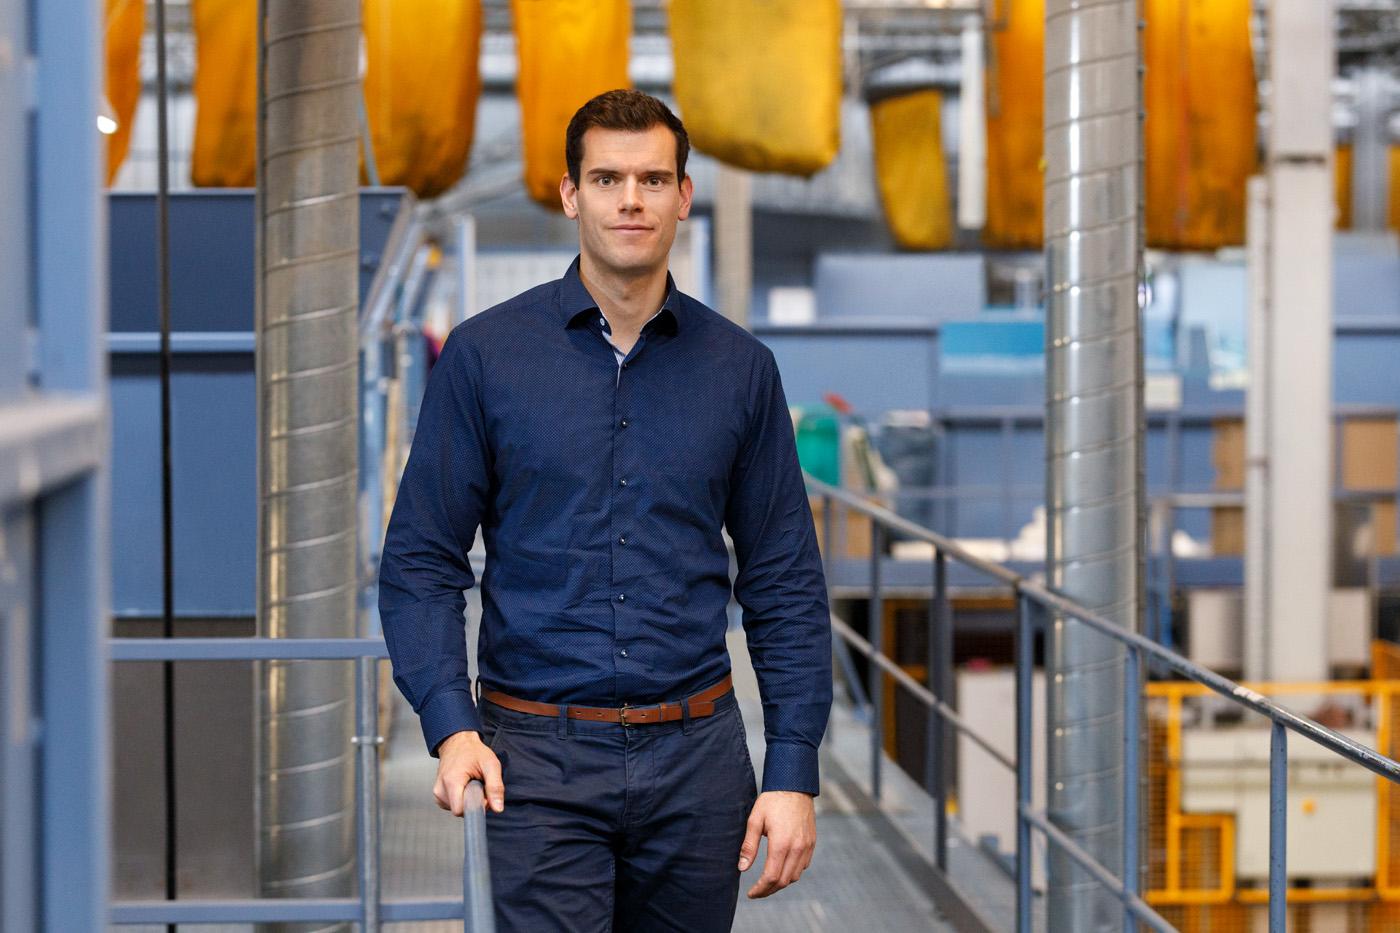 soex textilrecycling Businessporträt Produktionshalle